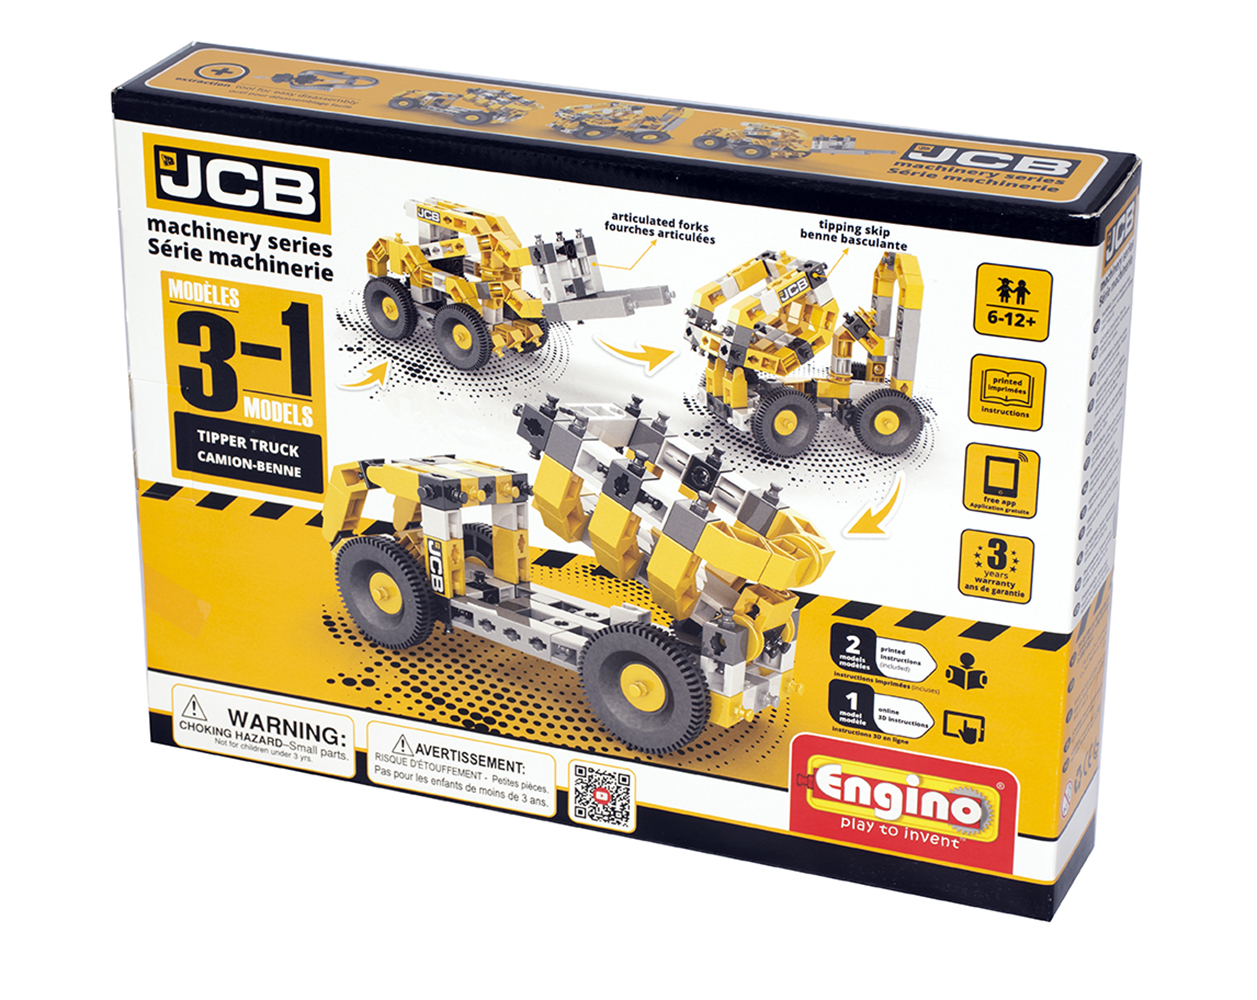 JCB Construction Series Camion Benne